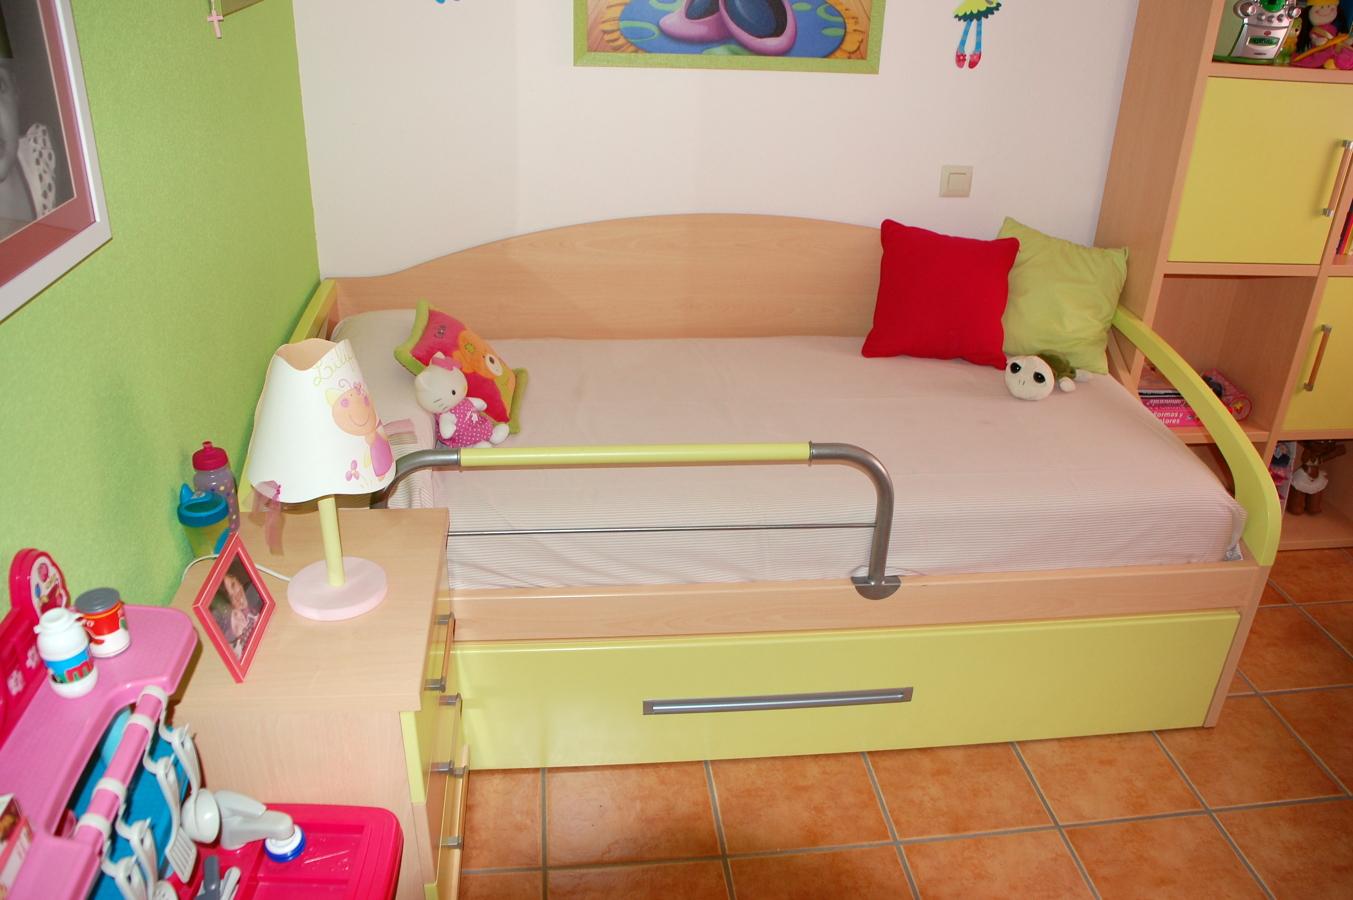 Dormitorio infantil ideas muebles - Muebles dormitorio infantil ...